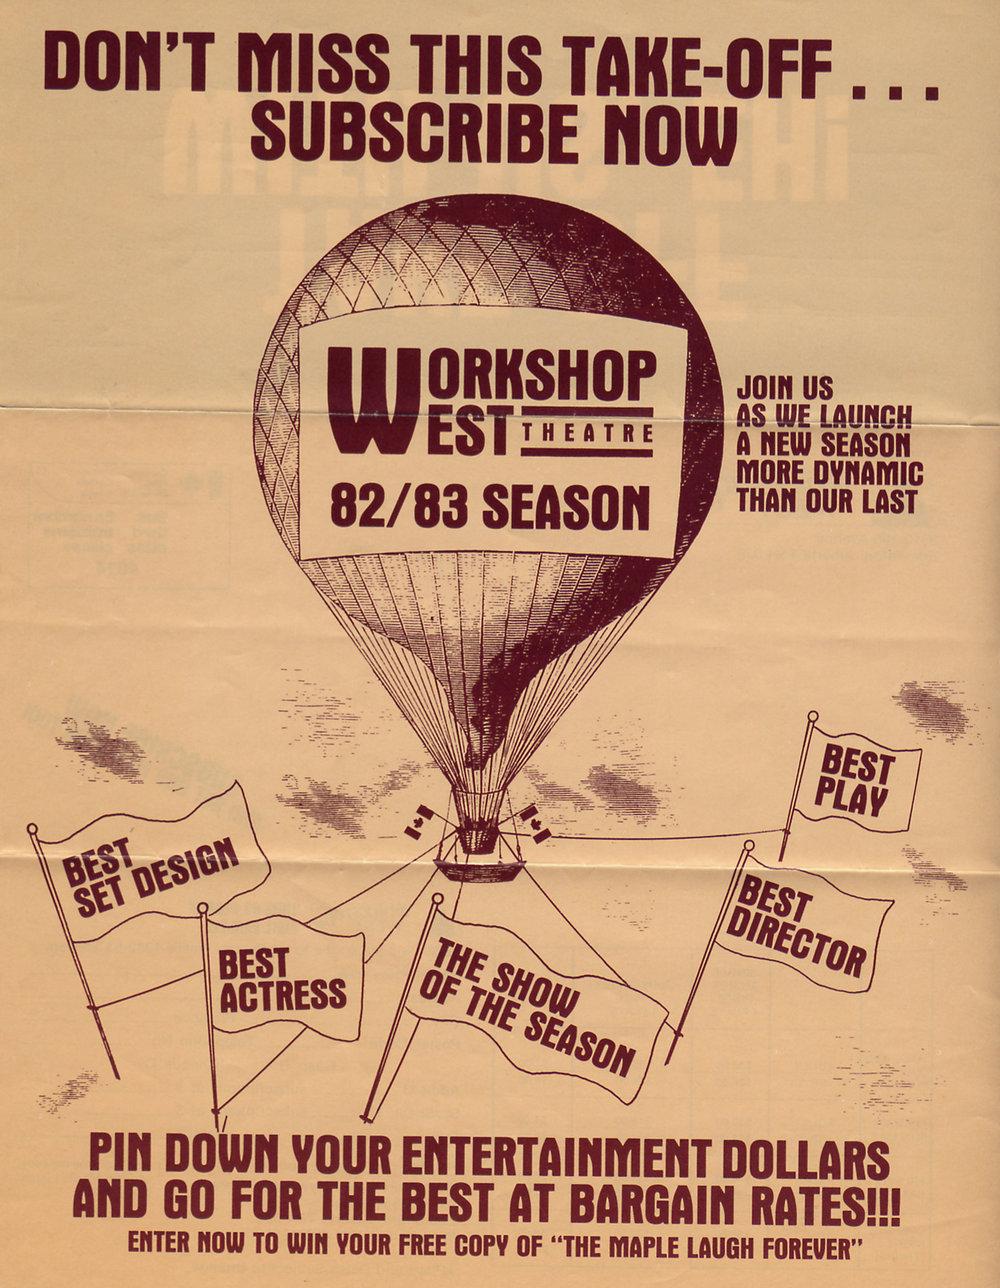 005-03. 82-83 SeasonBrochure2.jpg